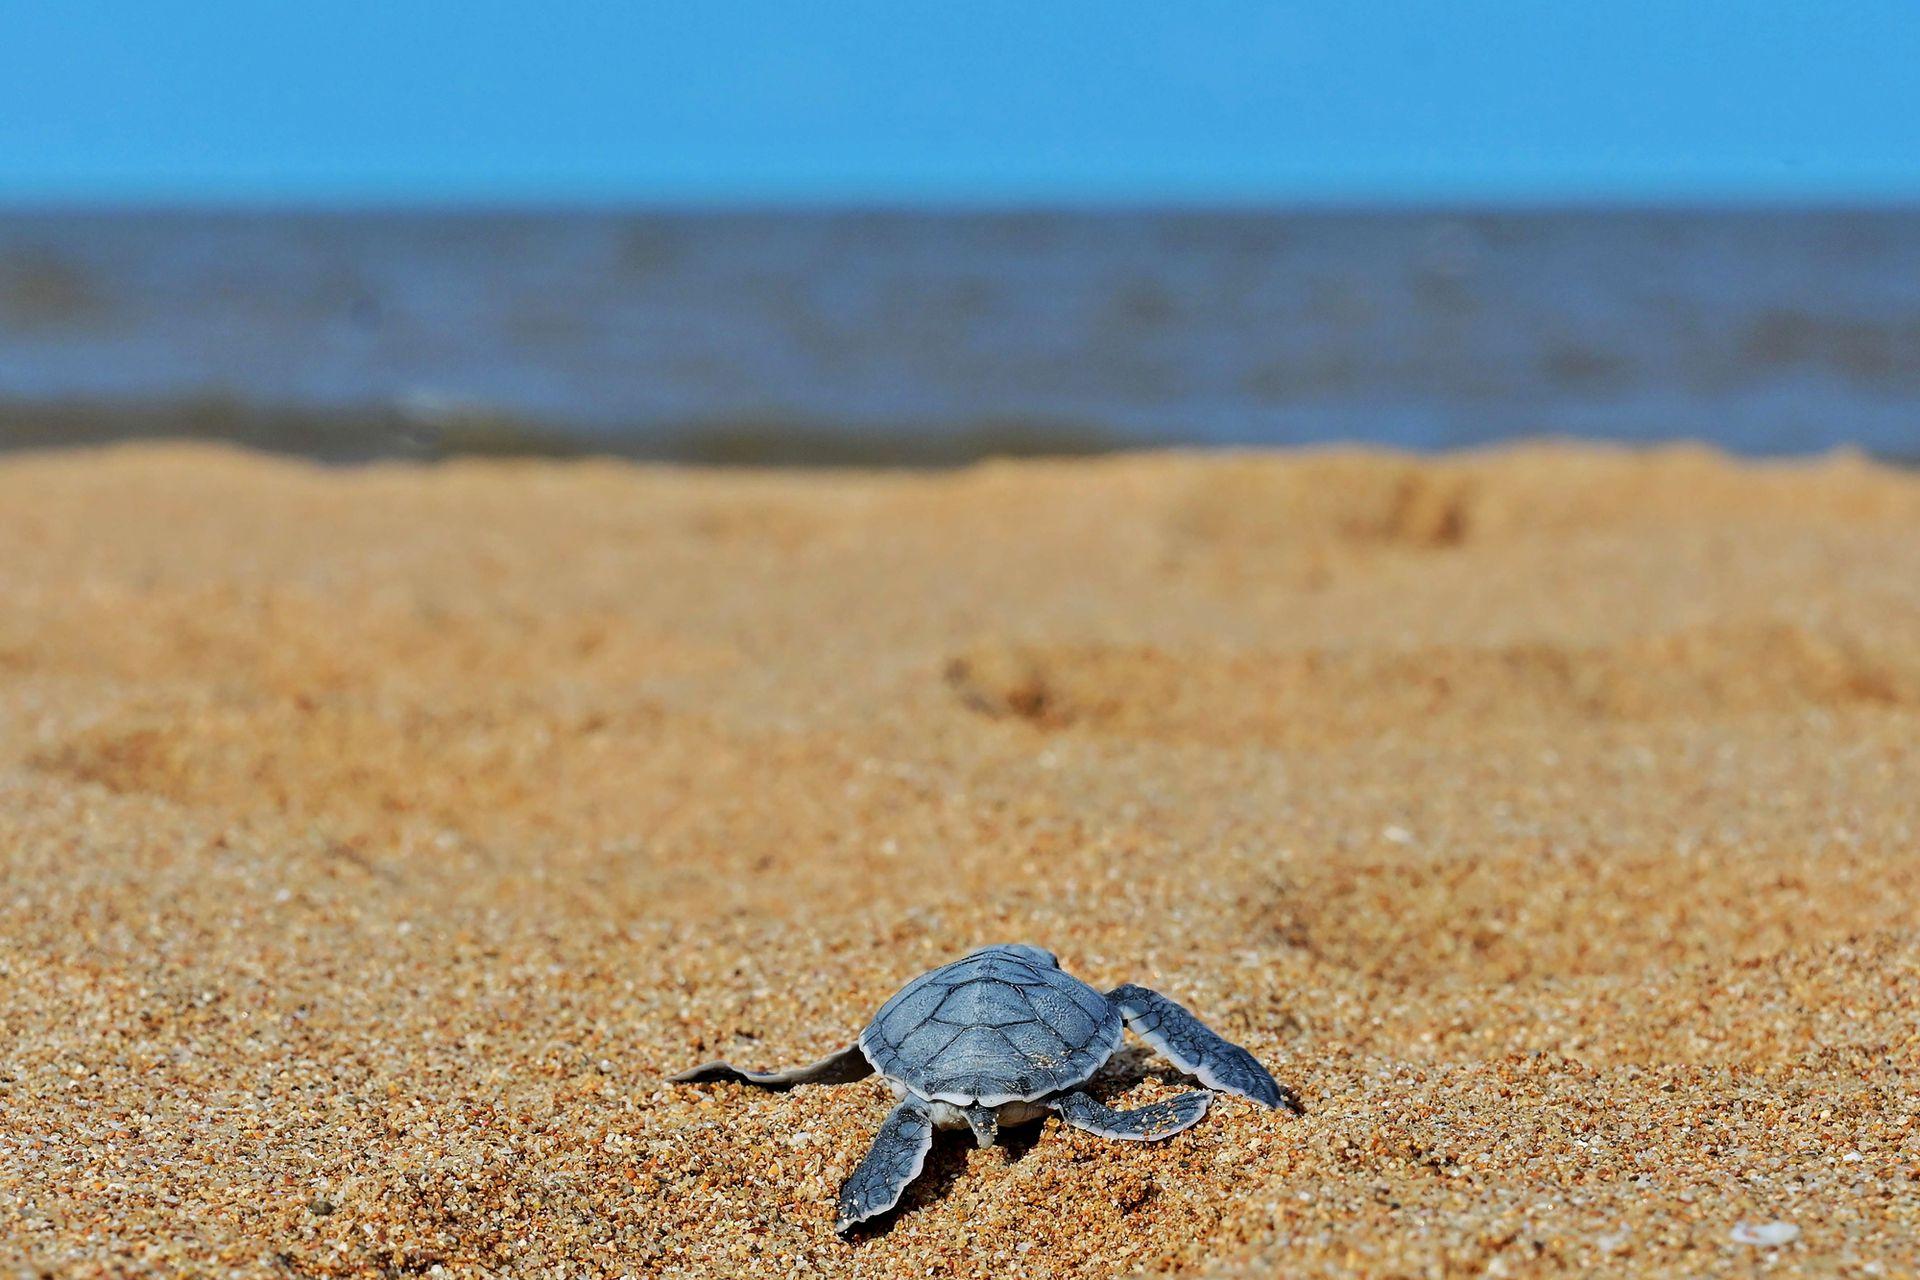 Las hembras suelen ir a poner huevos a las mimas playas donde anidó su madre